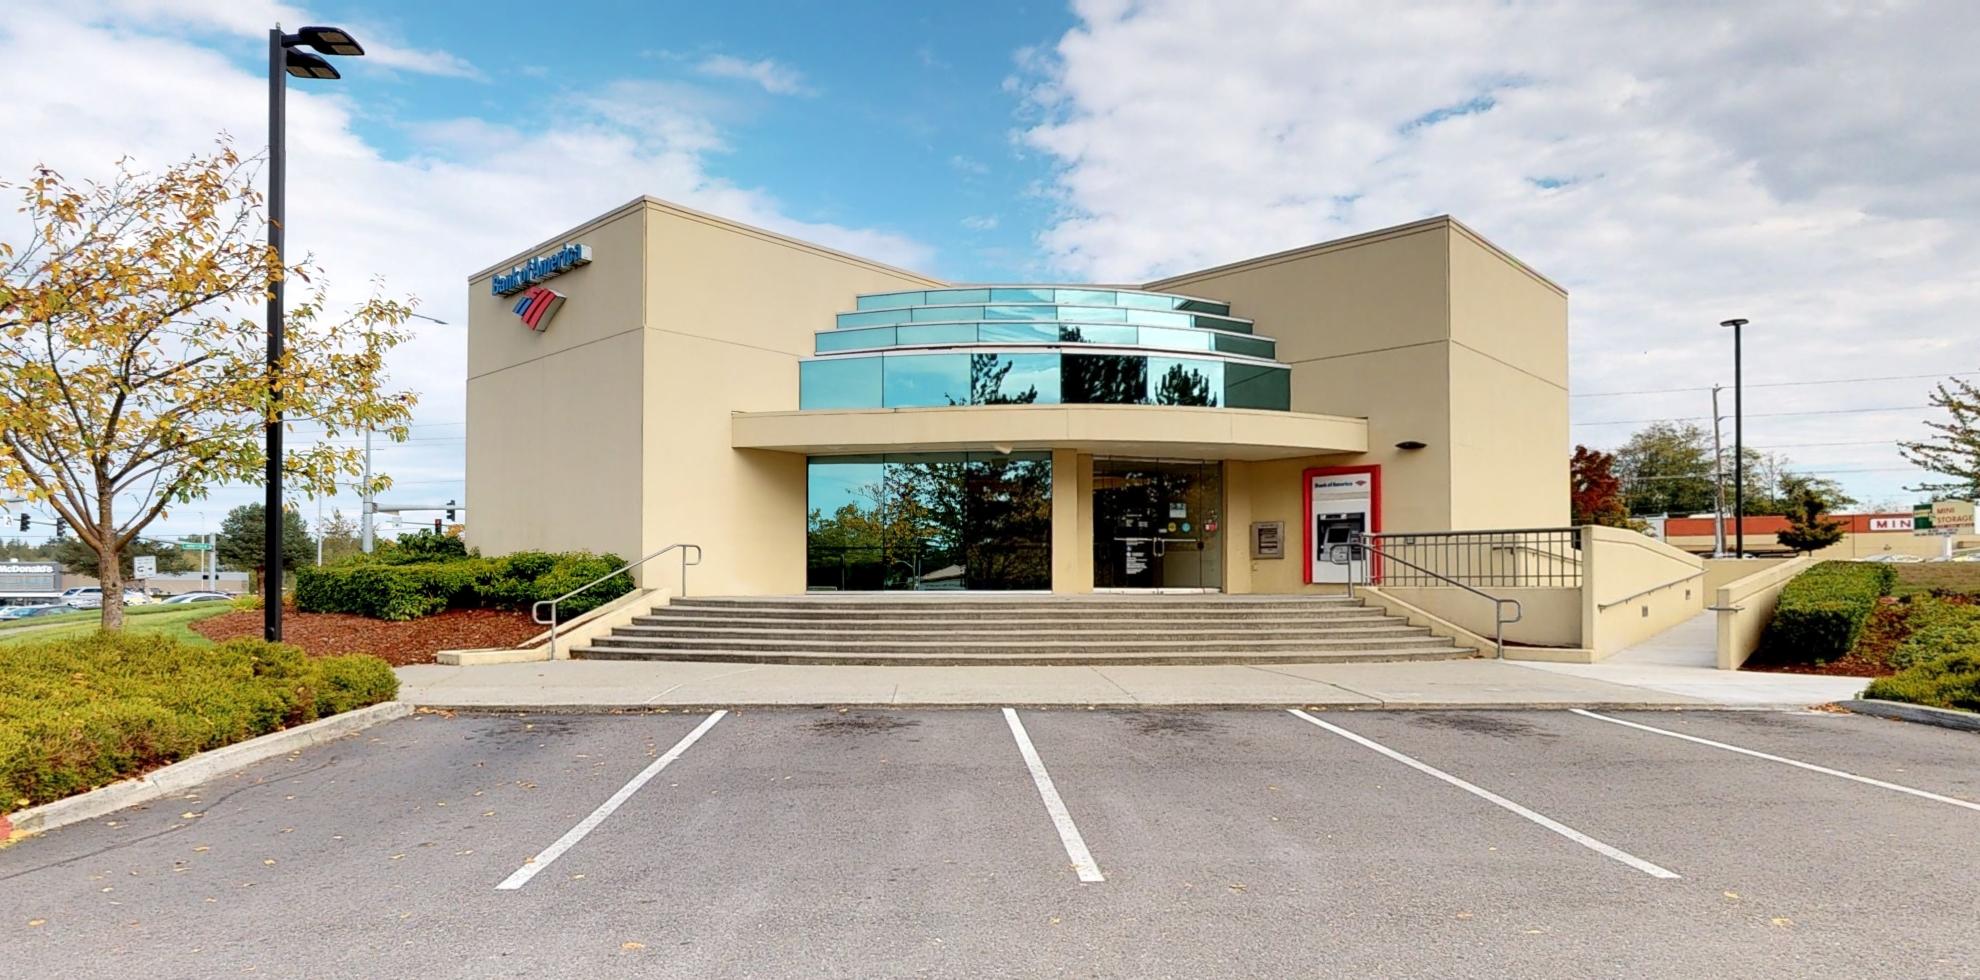 Bank of America financial center with drive-thru ATM | 3800 Harbour Pointe Blvd SW, Mukilteo, WA 98275